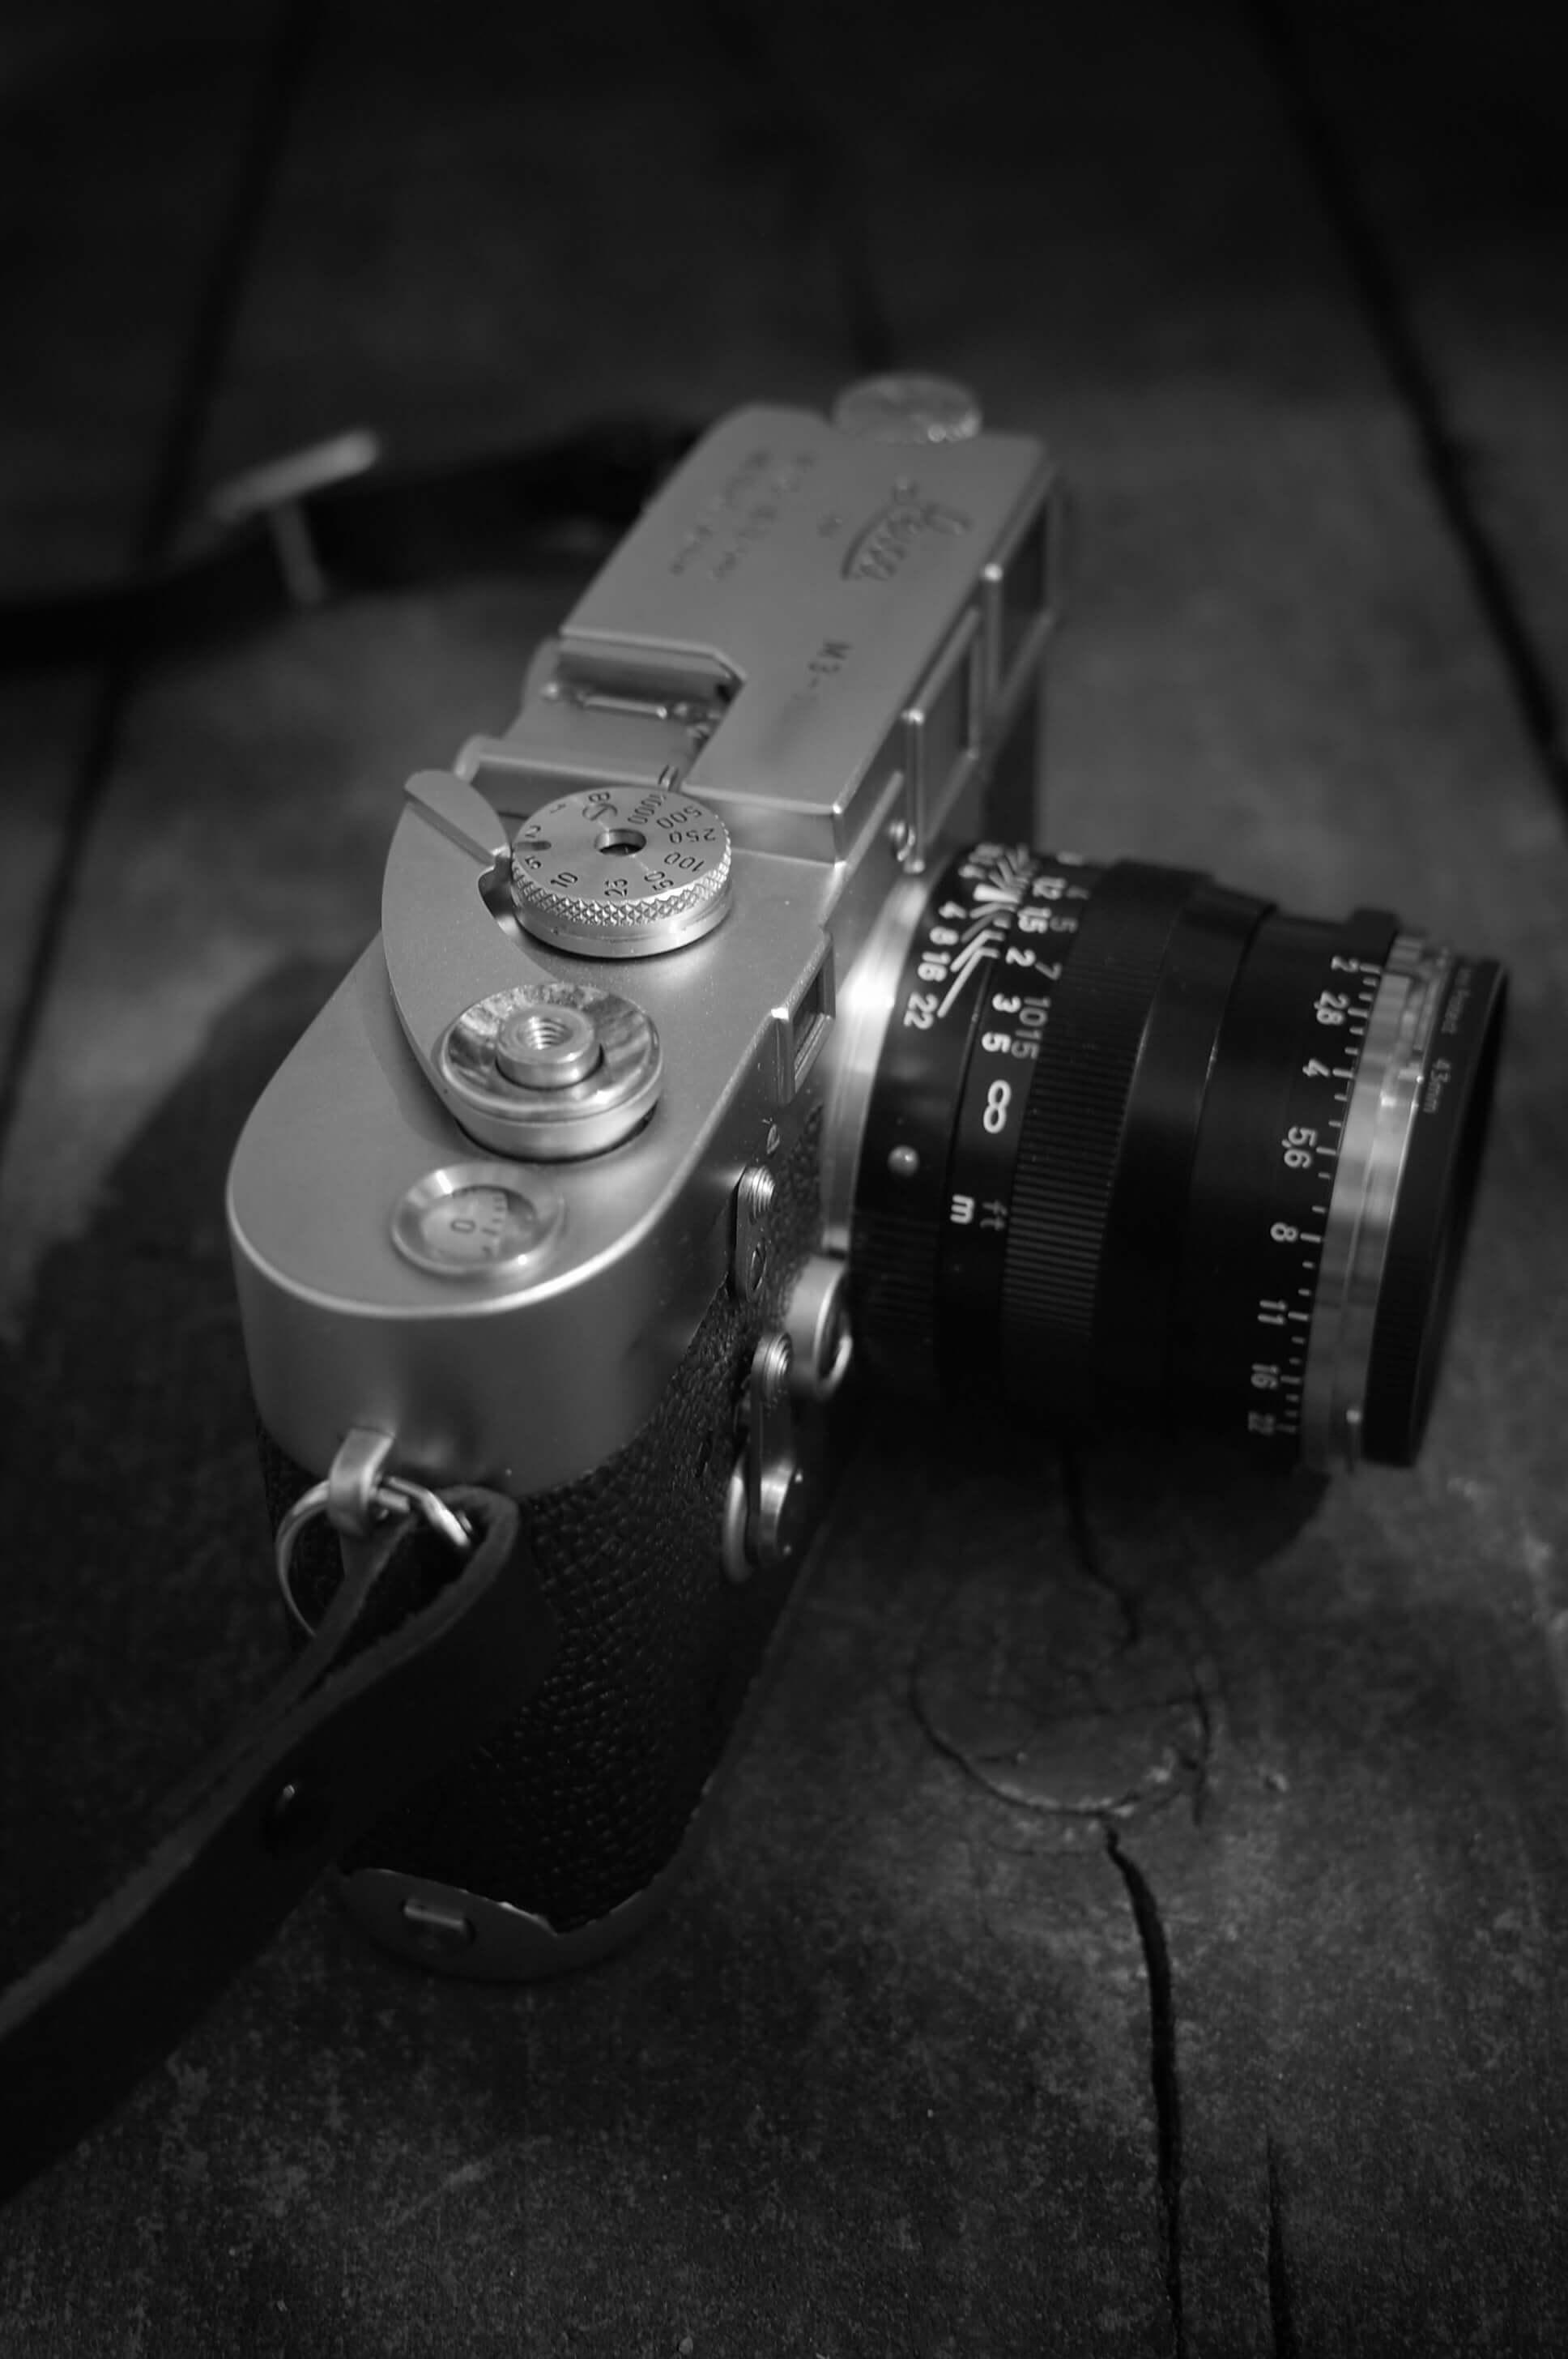 Leica M3というカメラが特別な存在であることは間違いない。